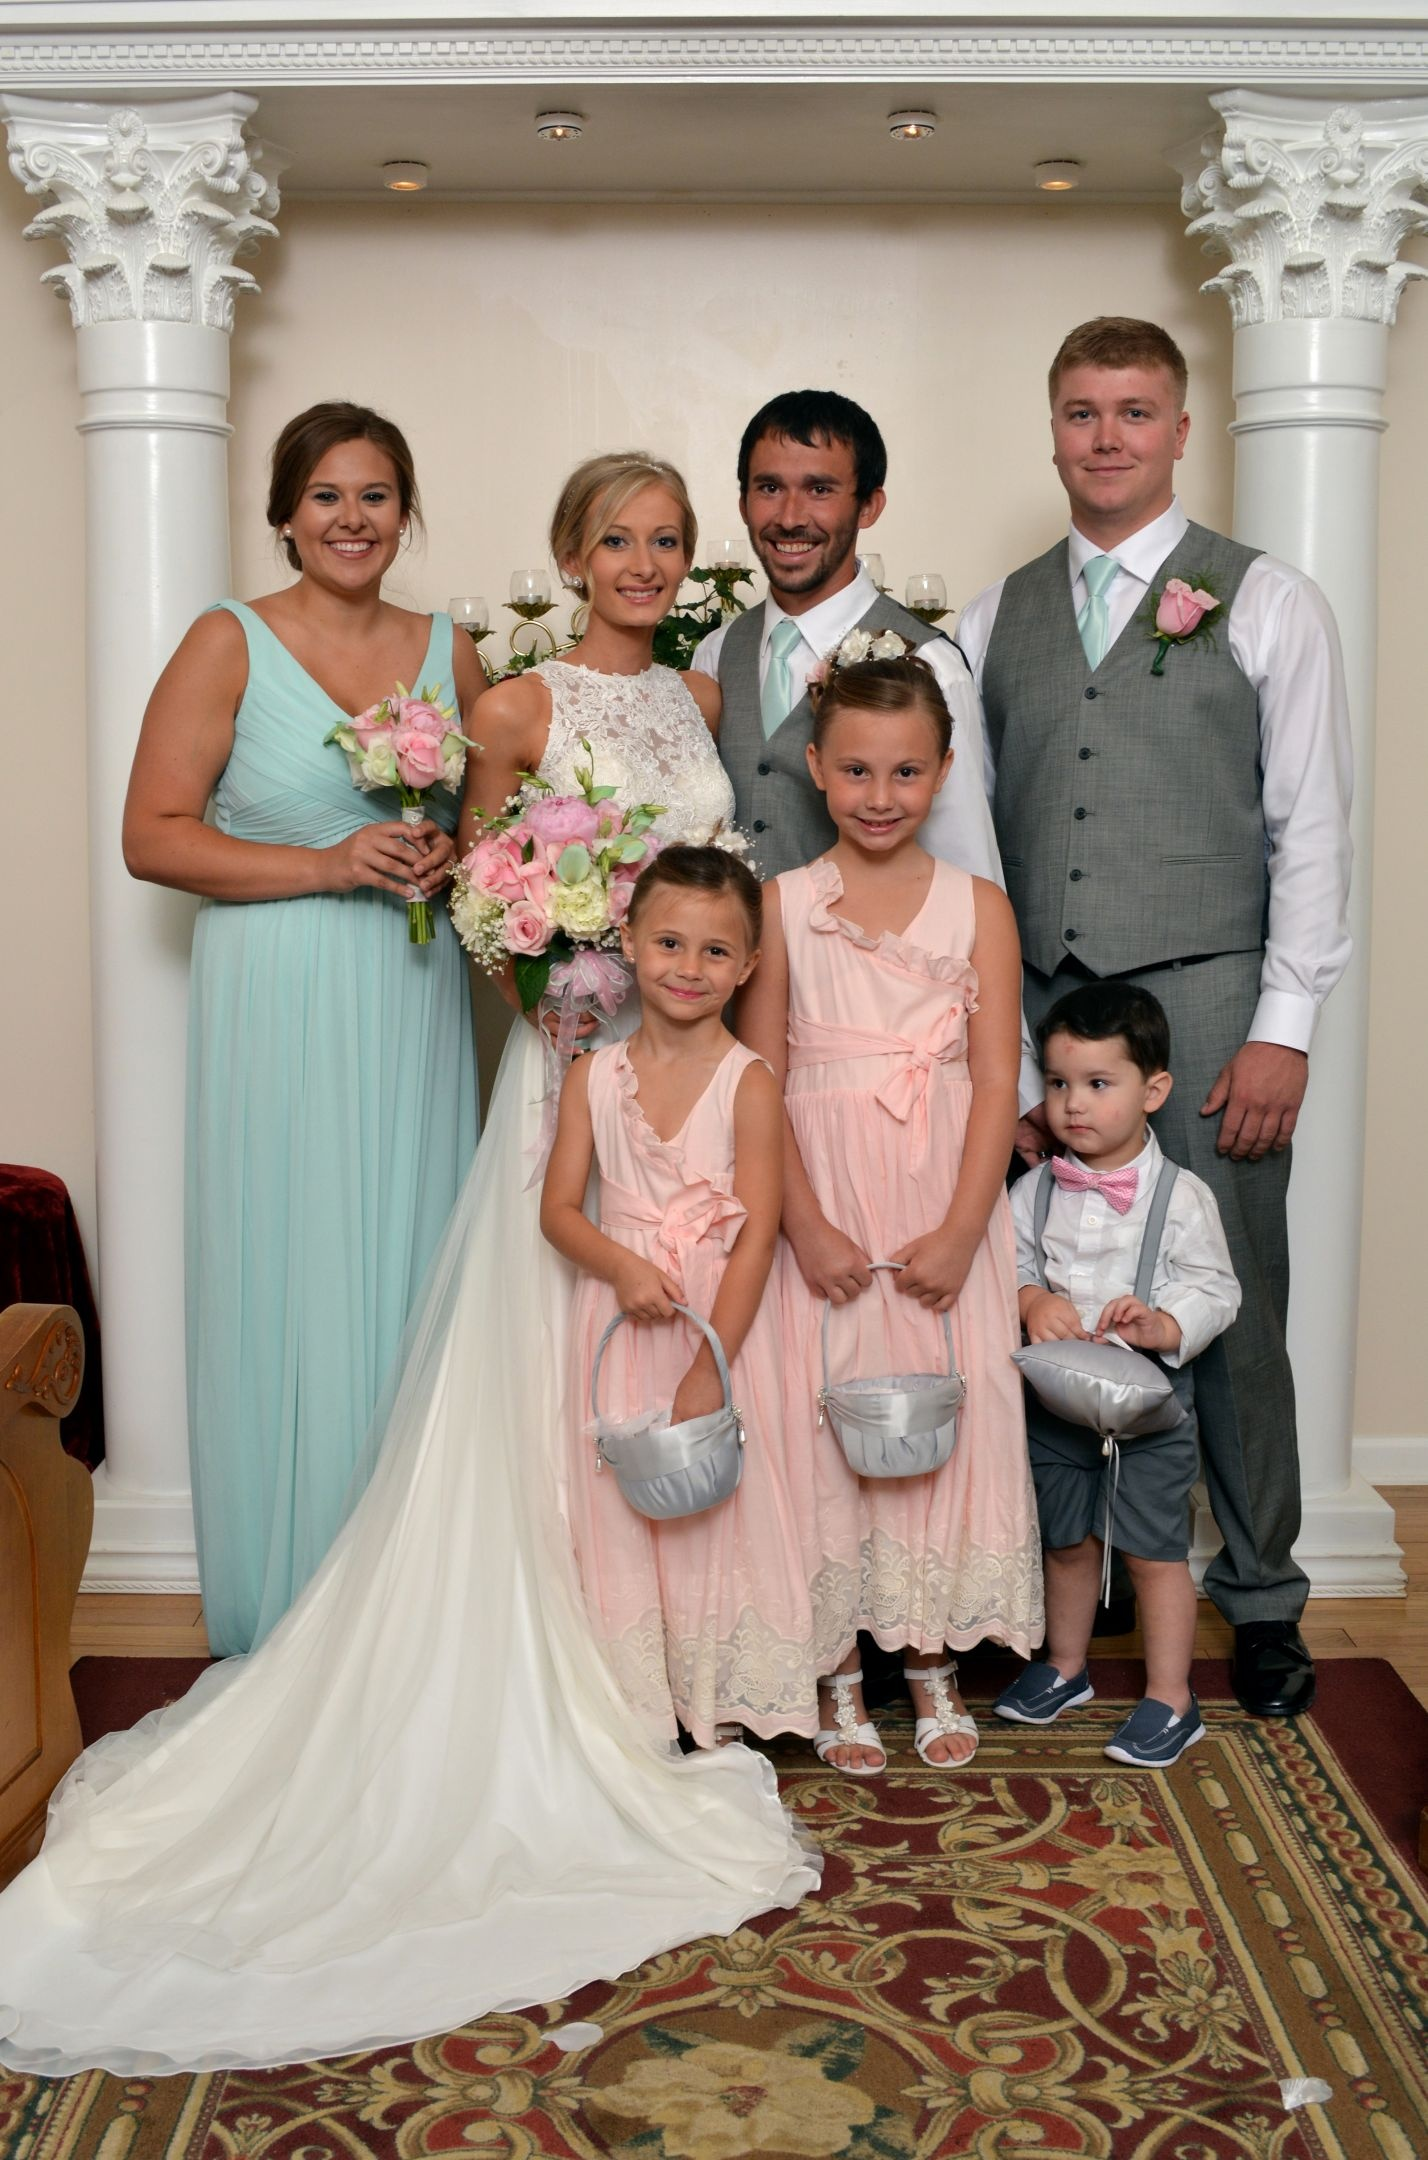 Wedding Chapel at Honeymoon Hills, Gatlinburg Wedding Chapel image 8